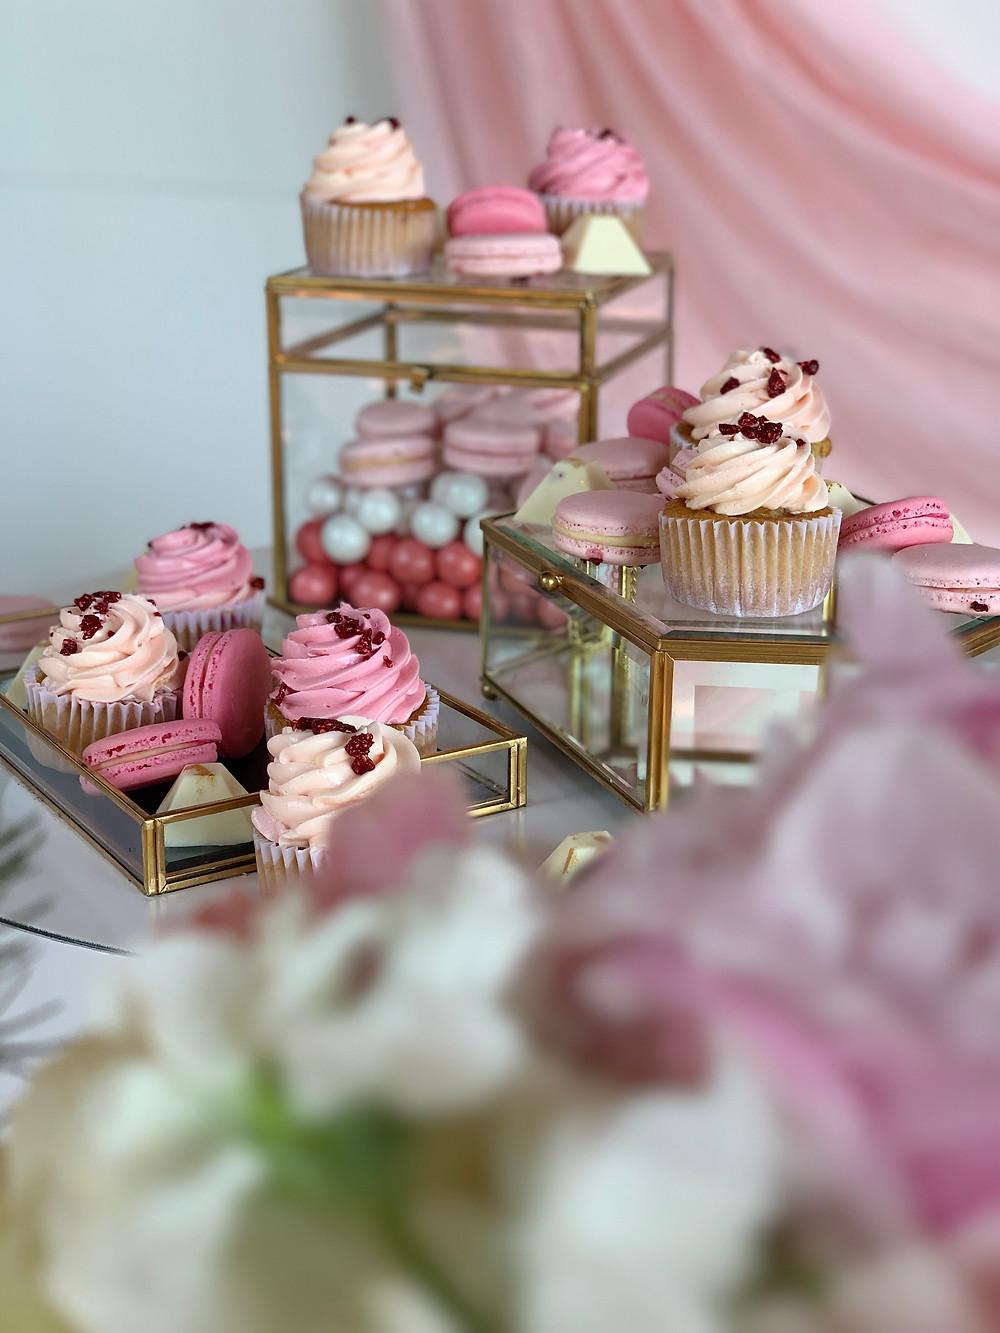 Cupcakes, macarons, bombones artesanales, mesa dulce